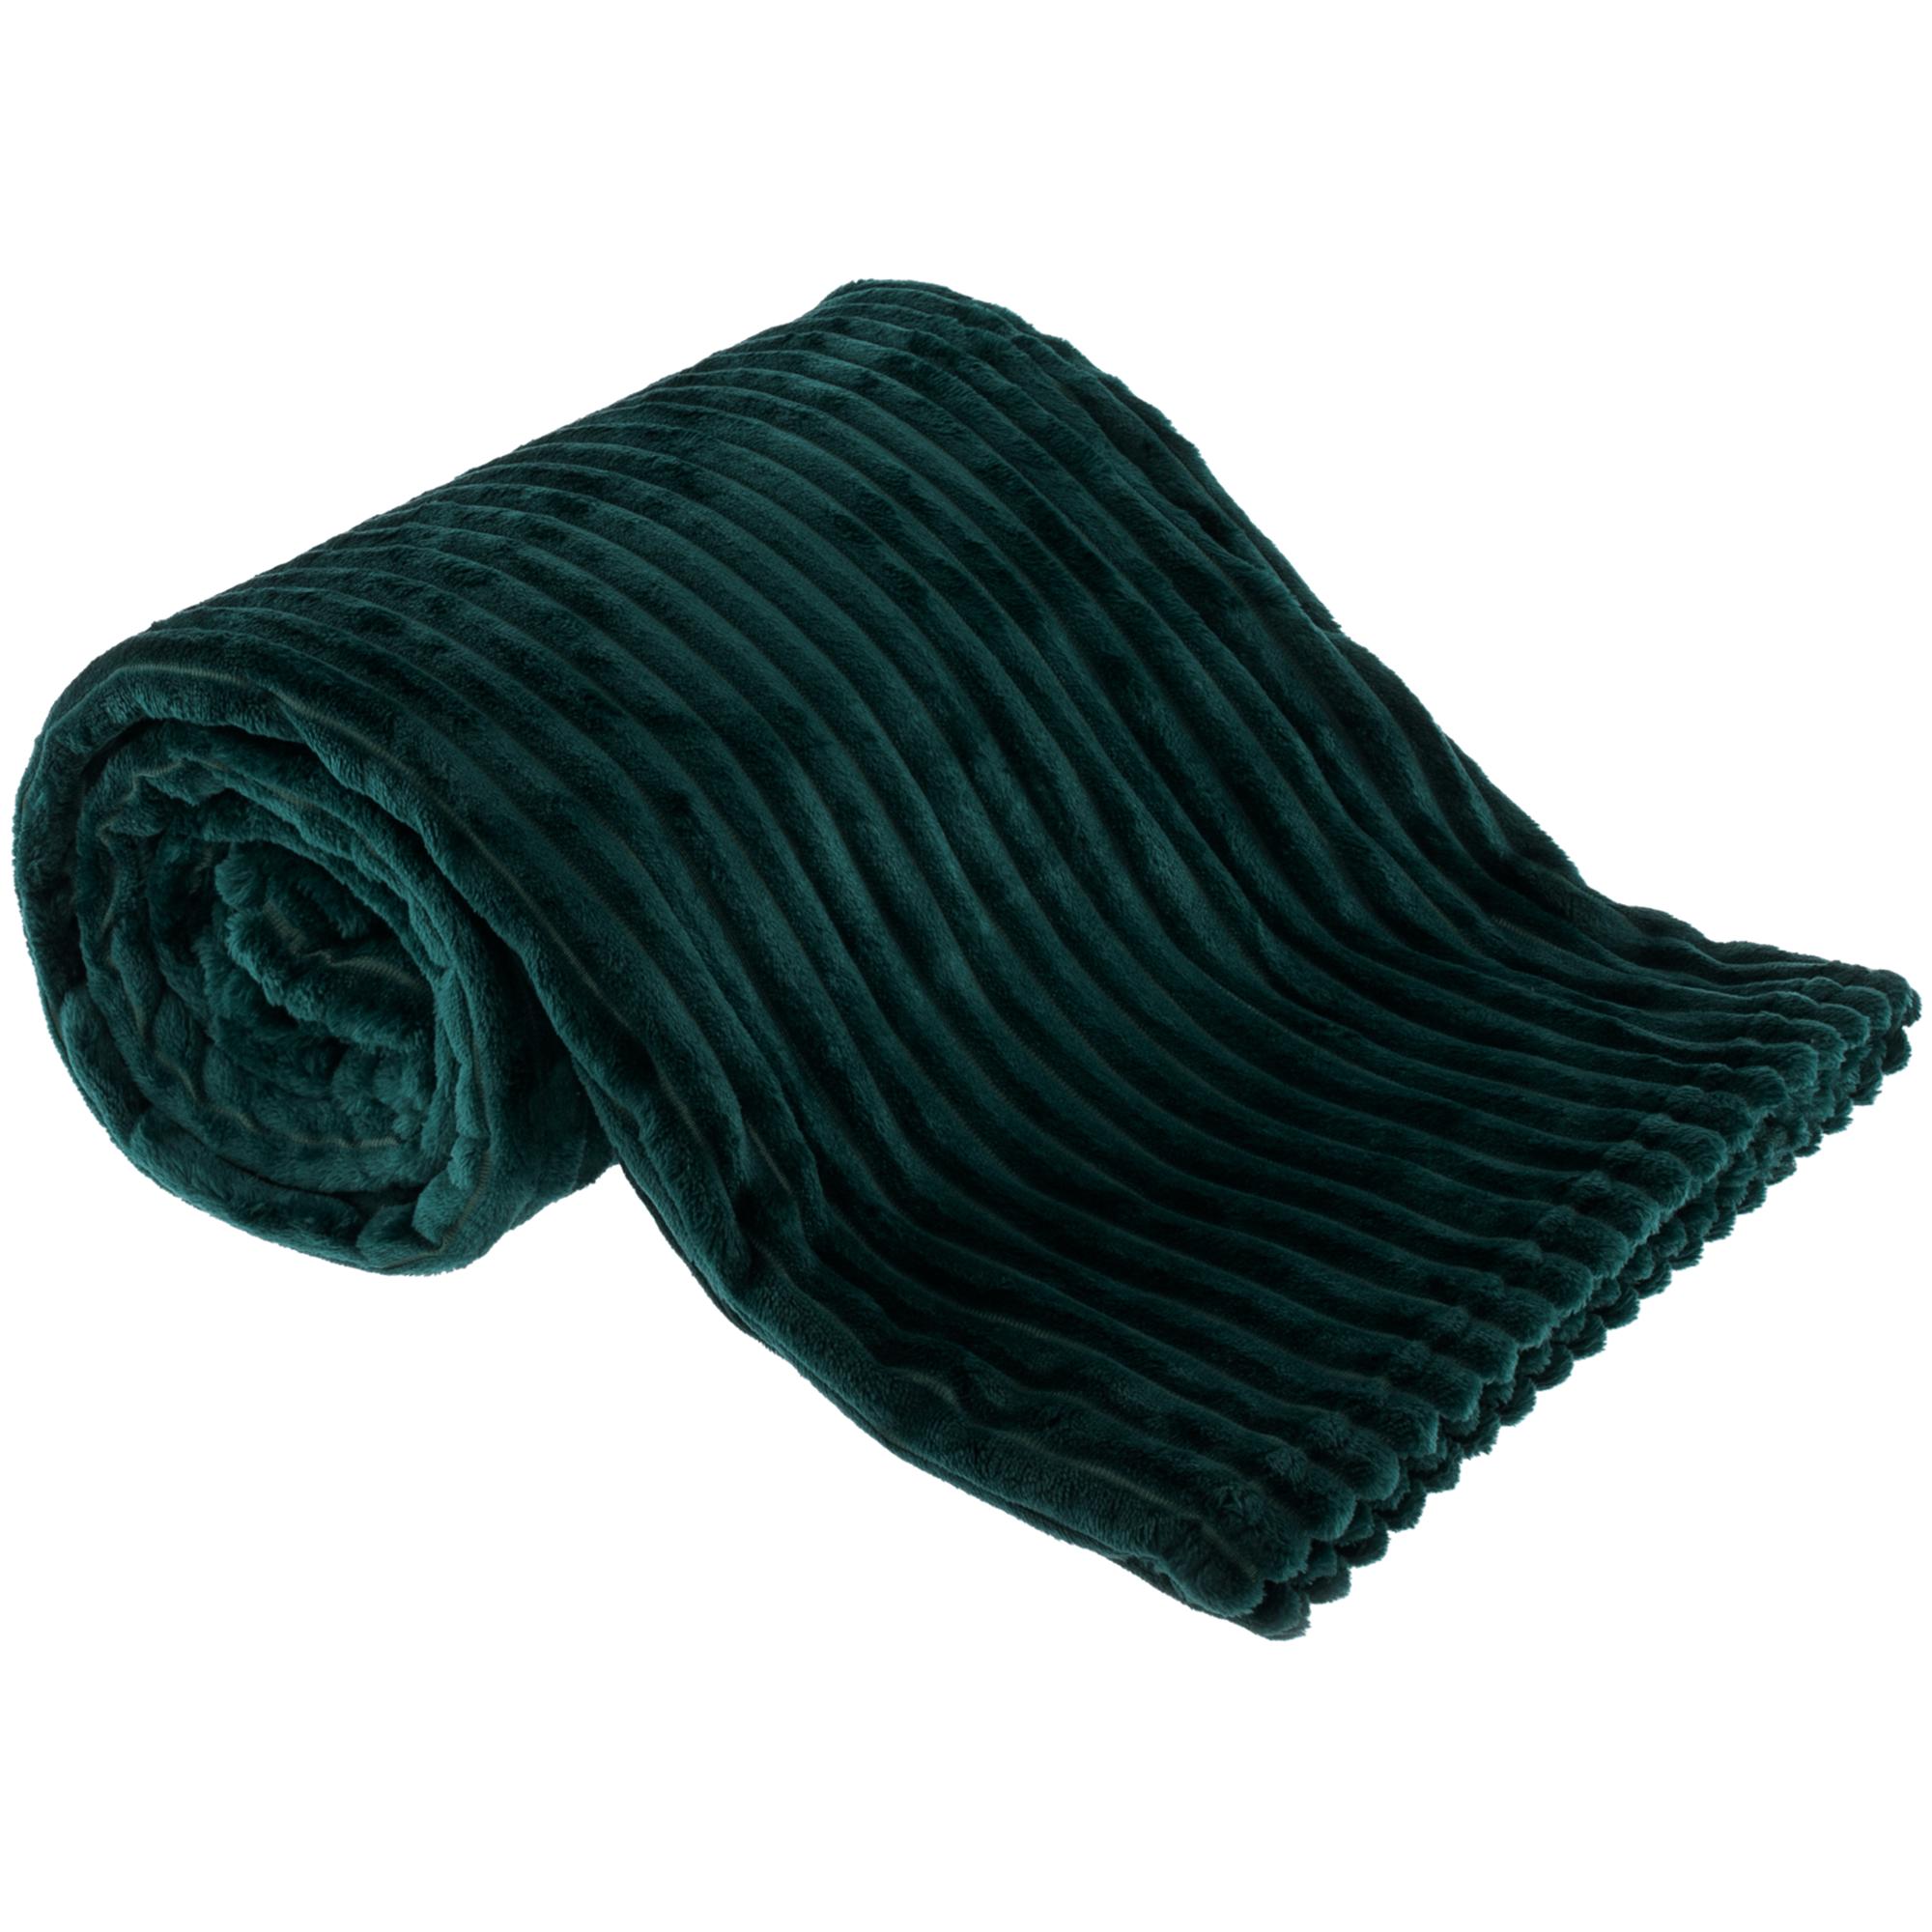 Plüss csíkos takaró, smaragd, 160x200cm, TELAL